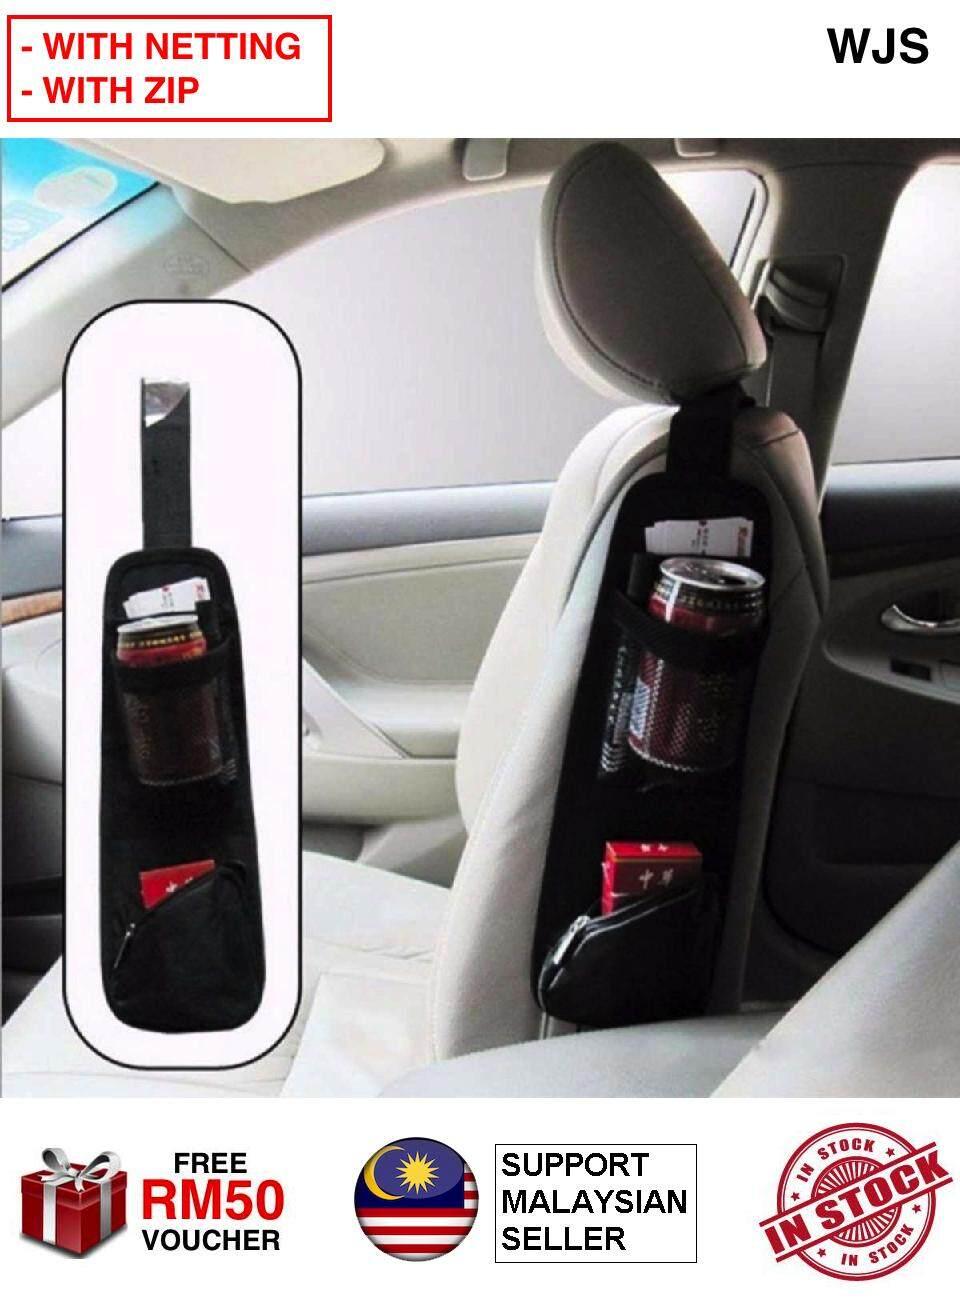 (WITH NETTING & ZIP) WJS Car Side Seat Organizer Multi Pocket Storage Organizer Car Storage Car Oganizer Organiser FULL BLACK [FREE RM 50 VOUCHER]